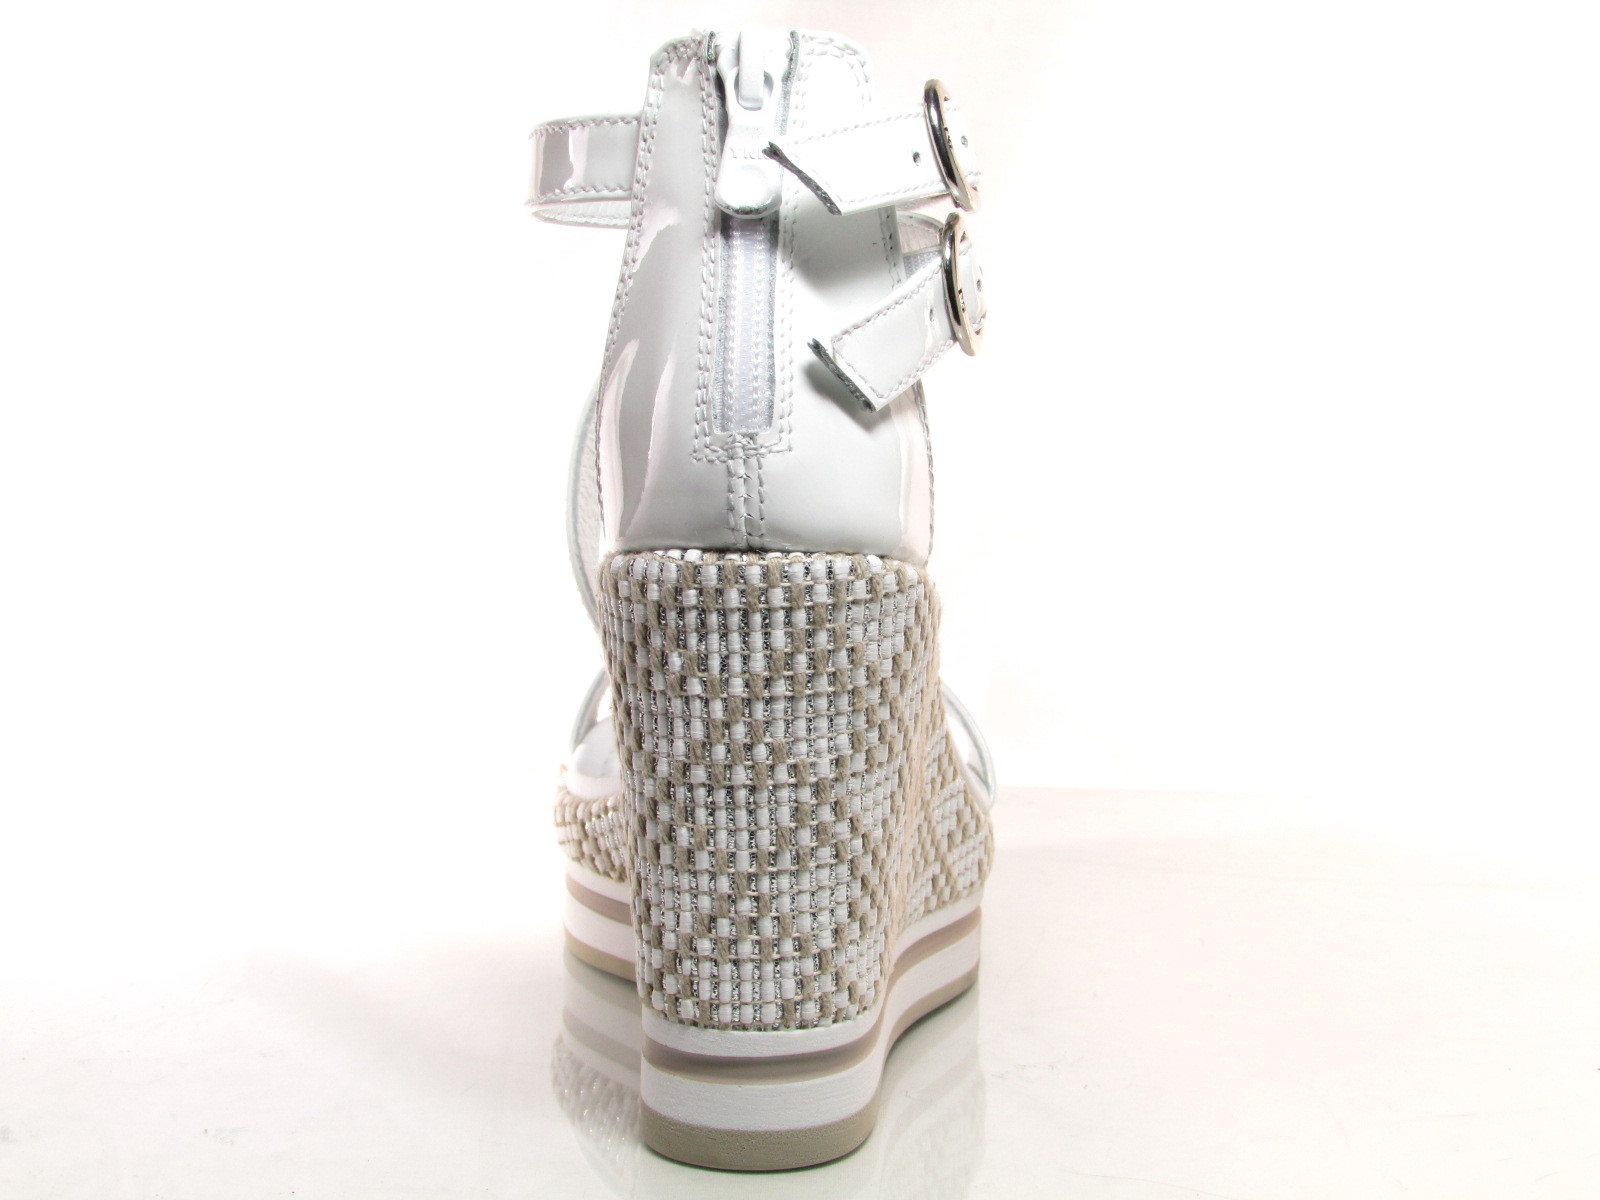 Nero Giardini P805900D sandali donna zeppa alta 10 cm naplak